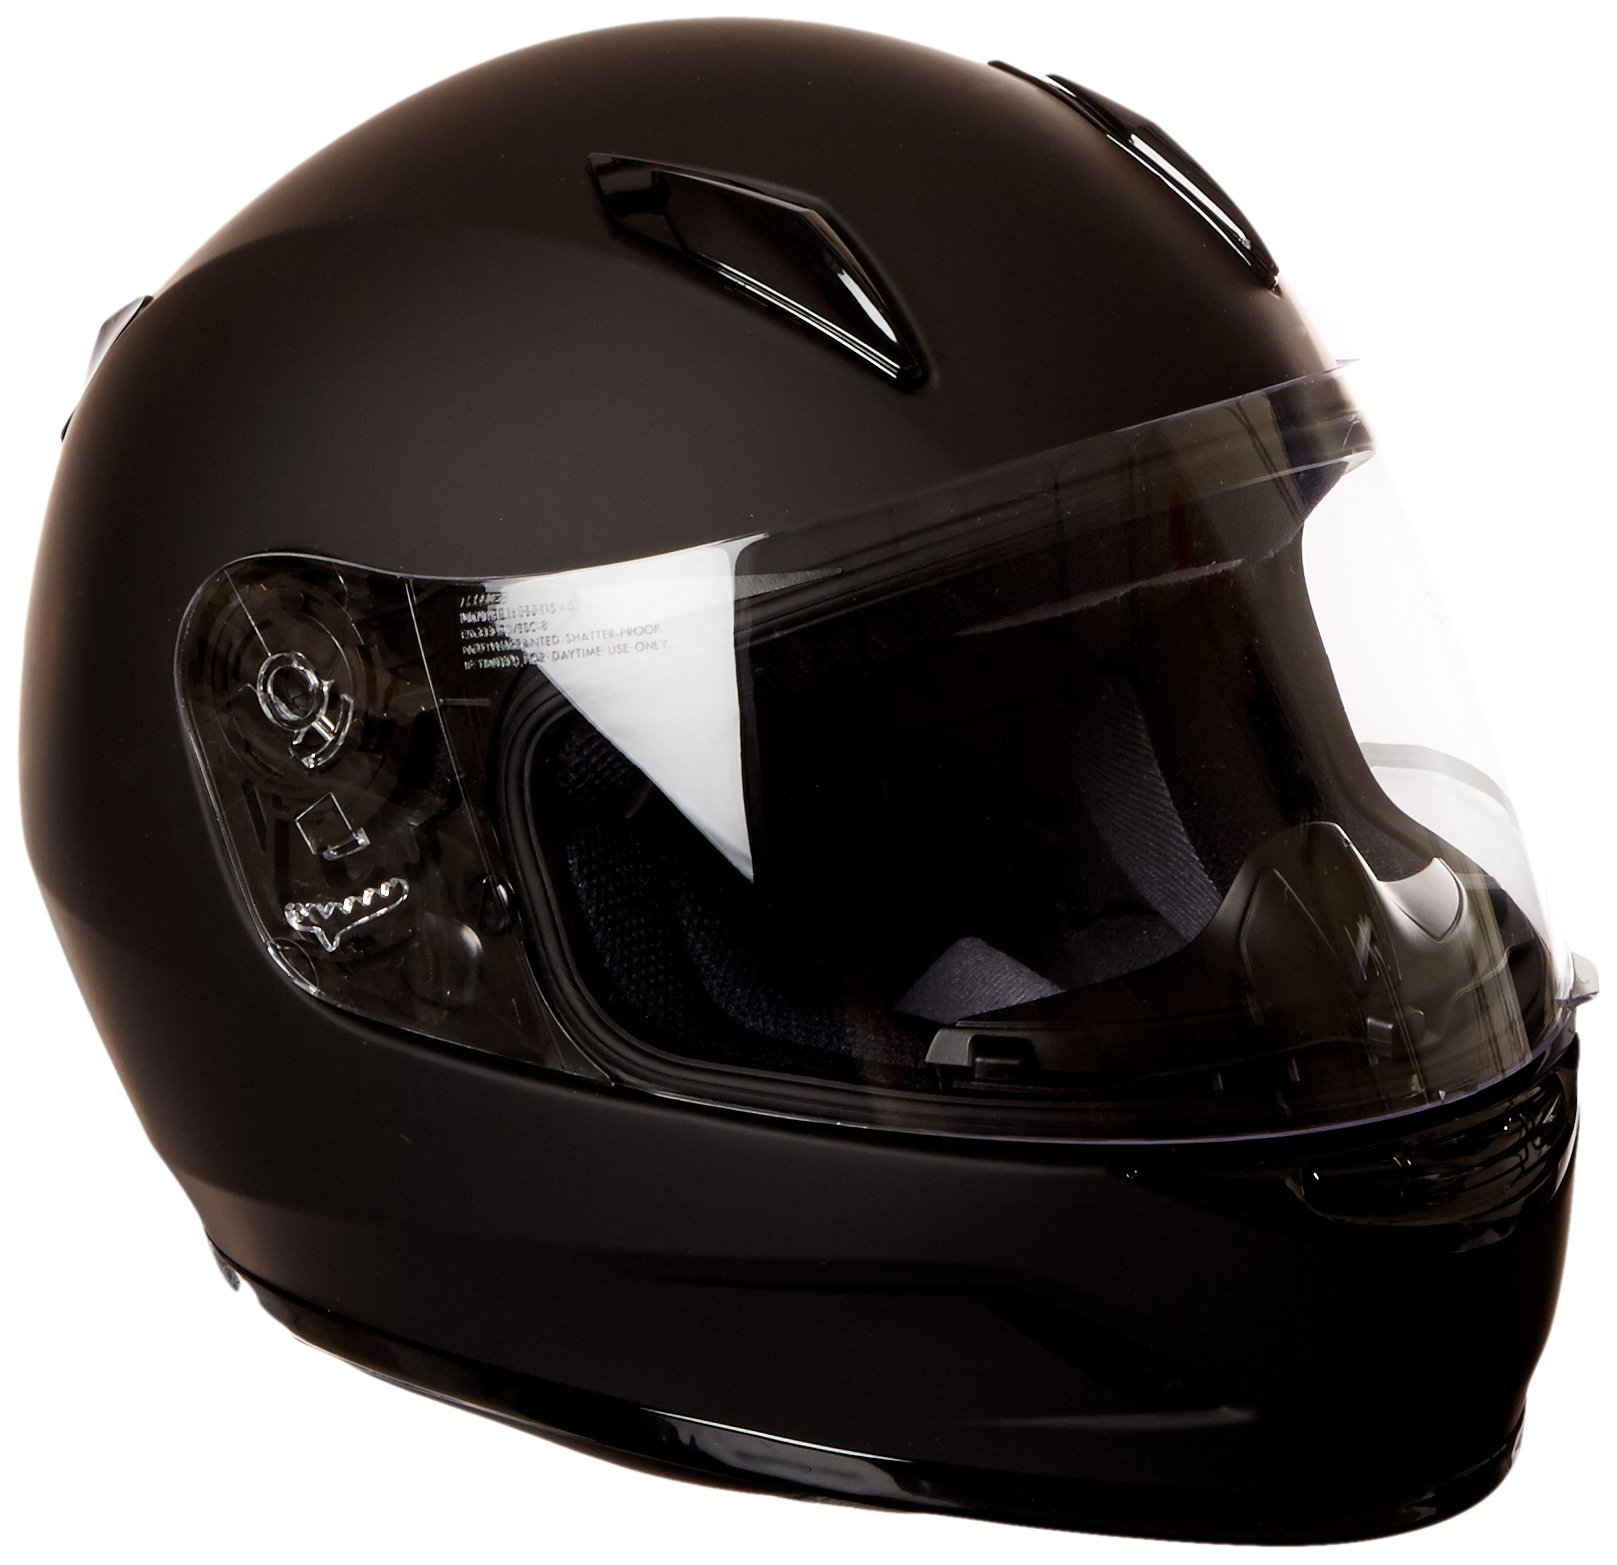 HJC Helmets CL-Y Youth Helmet (Matte Black, Medium) by HJC Helmets